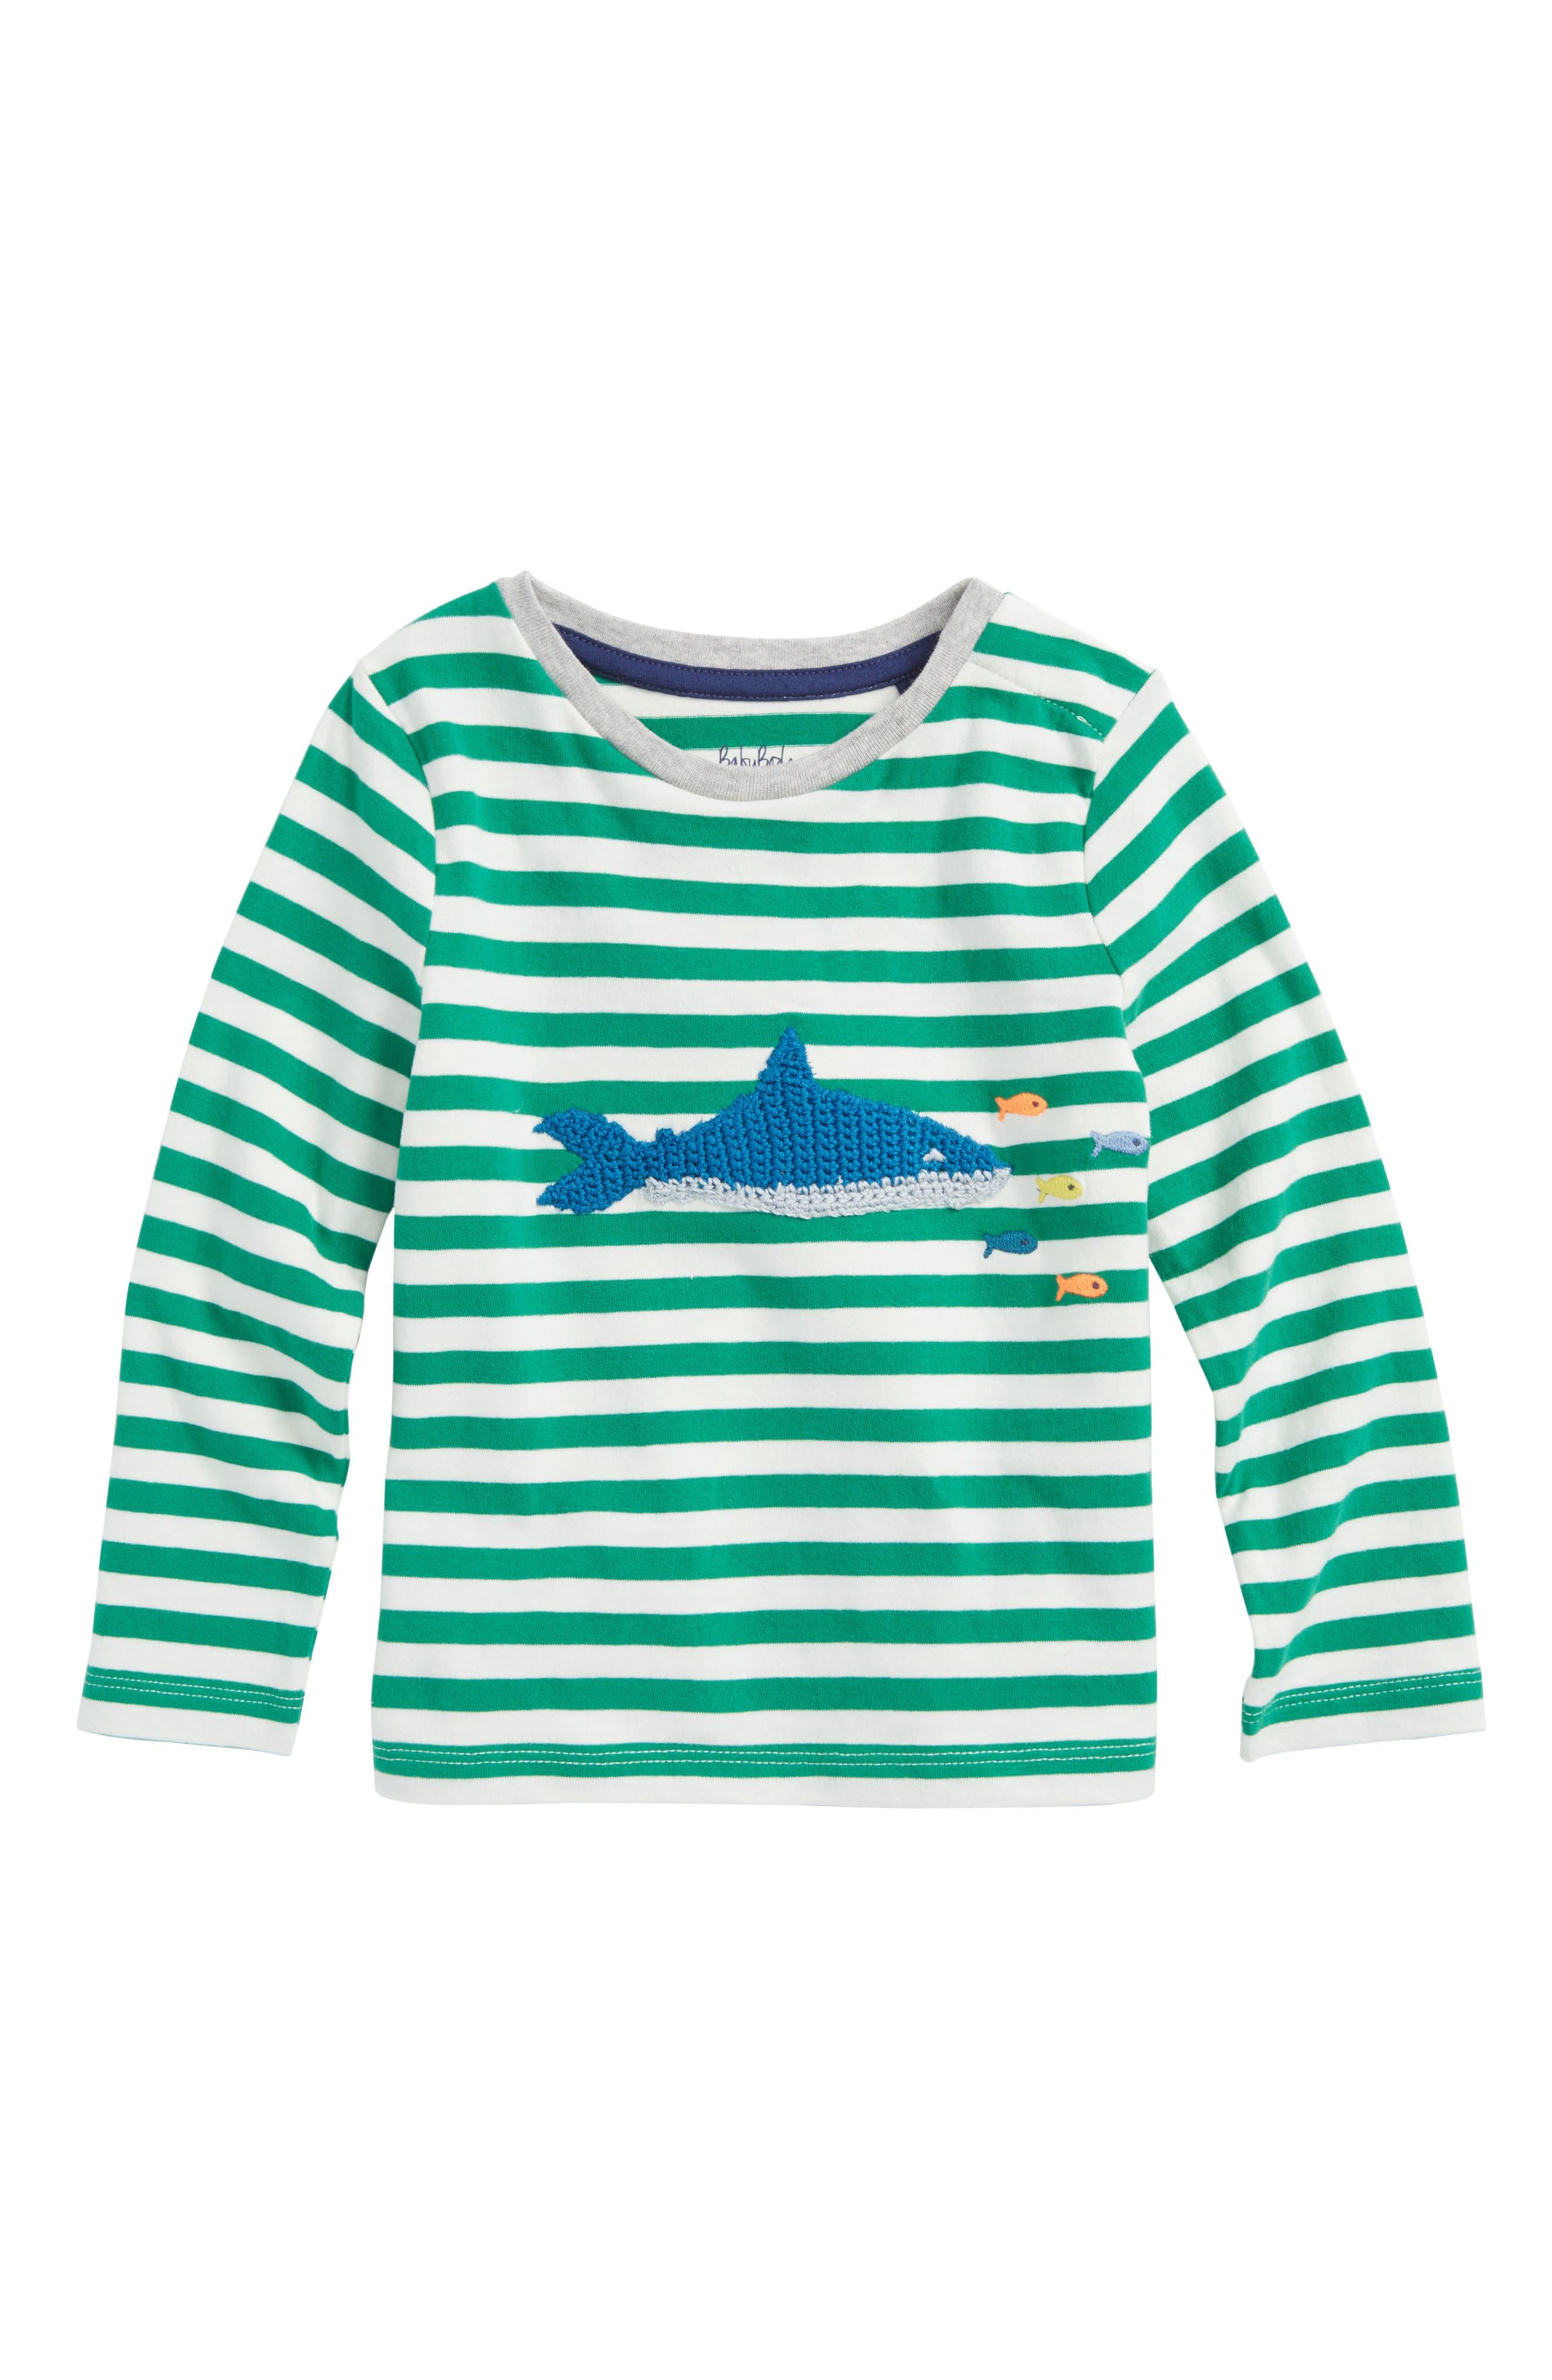 Stripy Crochet Appliqué T-Shirt,                             Main thumbnail 1, color,                             Ecru/ Watercress